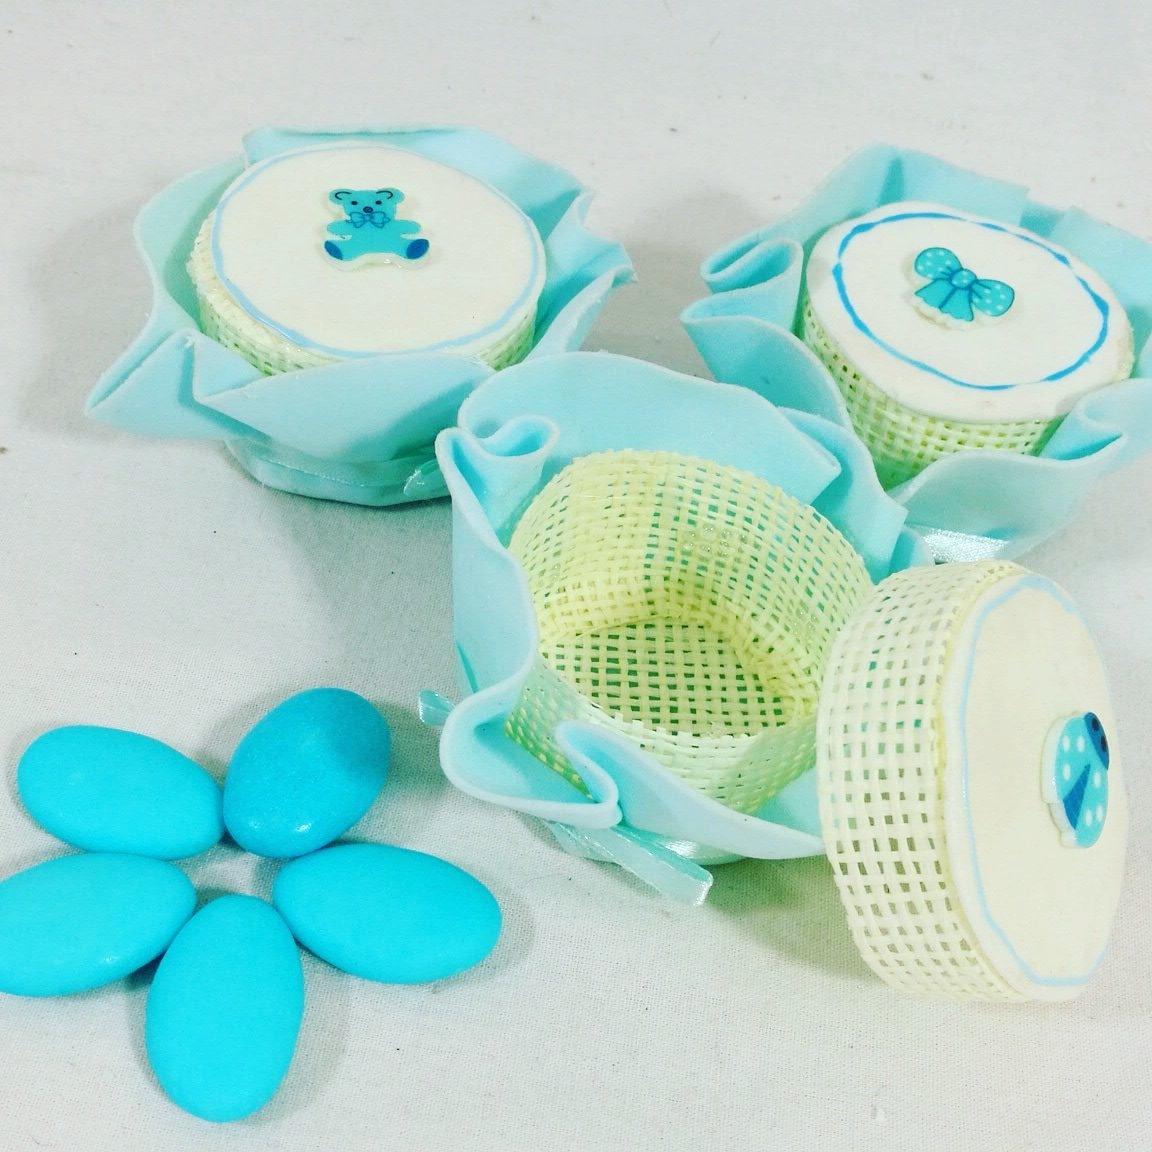 Sindy Celeste caja portaconfetti caja Bombonera de Letrero para bautismo cumpleaños nacimiento - 24 cajas + 1 paquete de Confetti ciocopassion al Leche Apr: ...